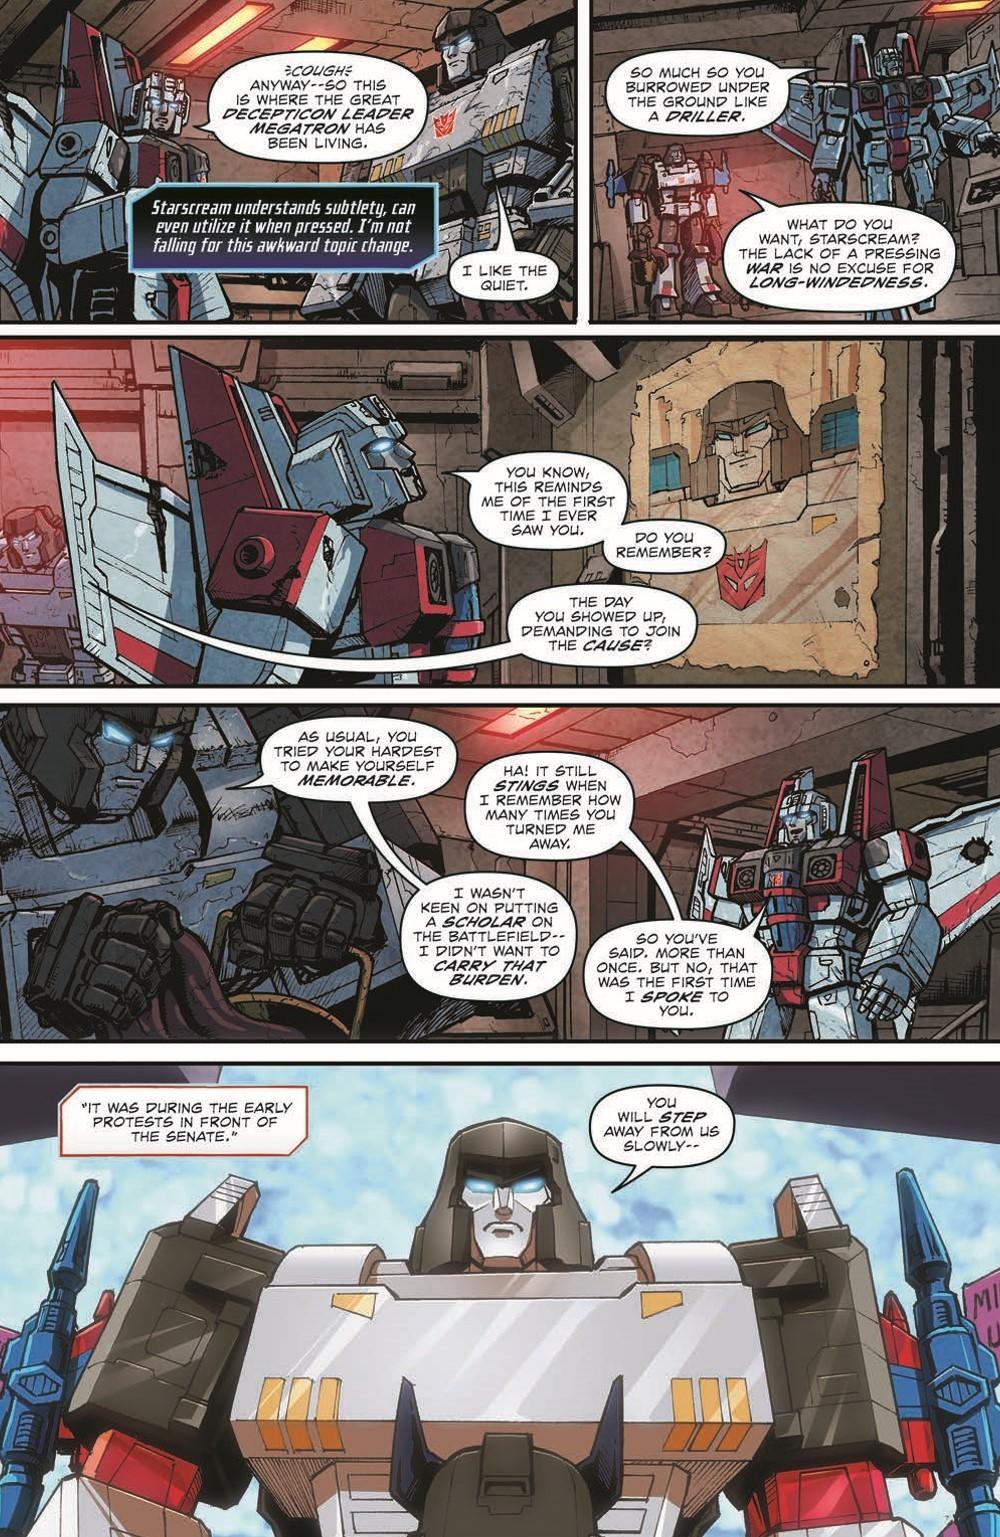 TF_ShatGlass02-pr-6 ComicList Previews: TRANSFORMERS SHATTERED GLASS #2 (OF 5)